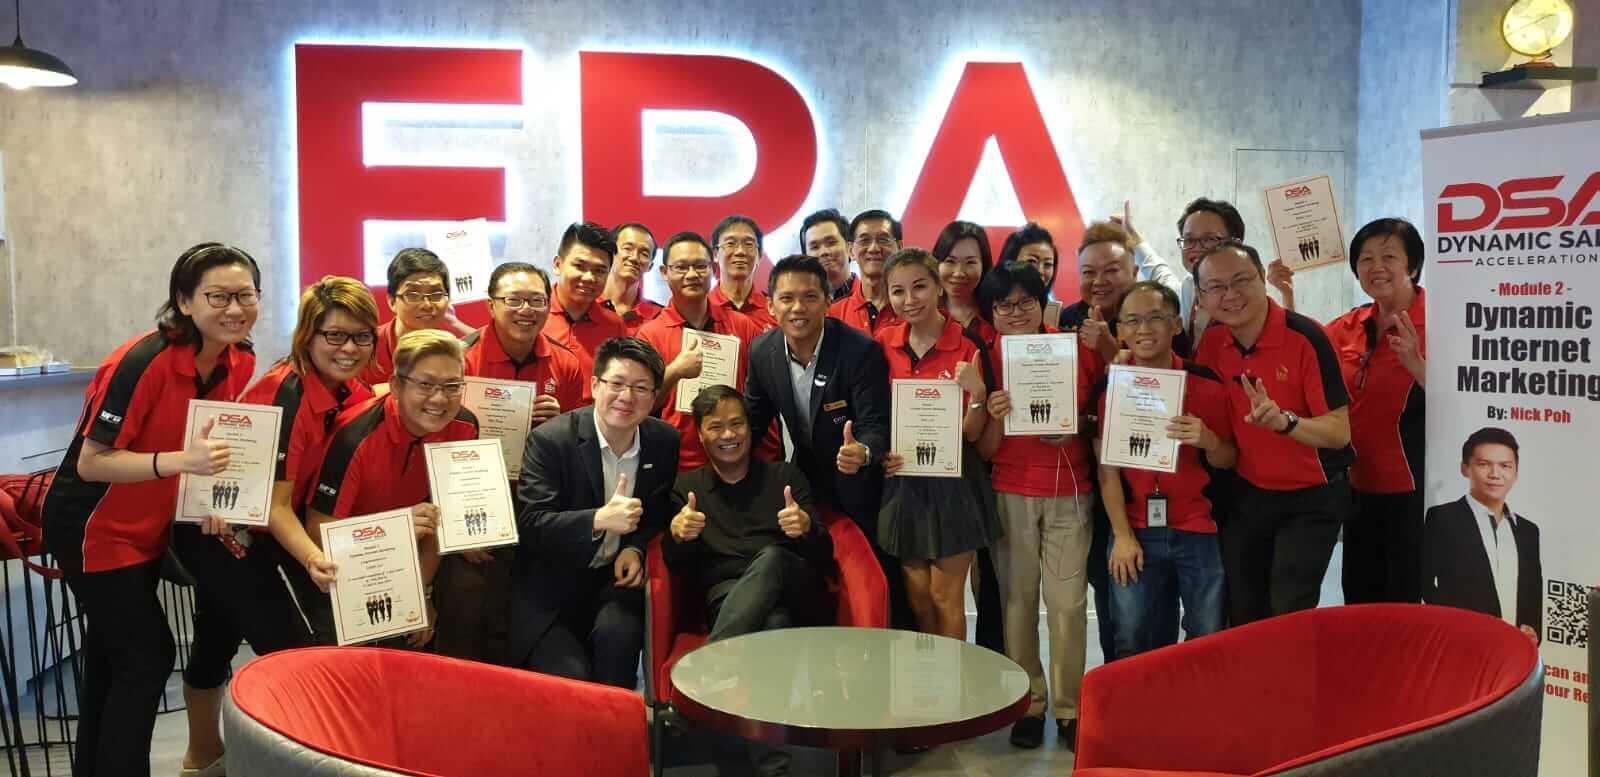 Dynamic Internet Marketing (Graduation - Group Photo) - Dynamic Force Group (DFG)